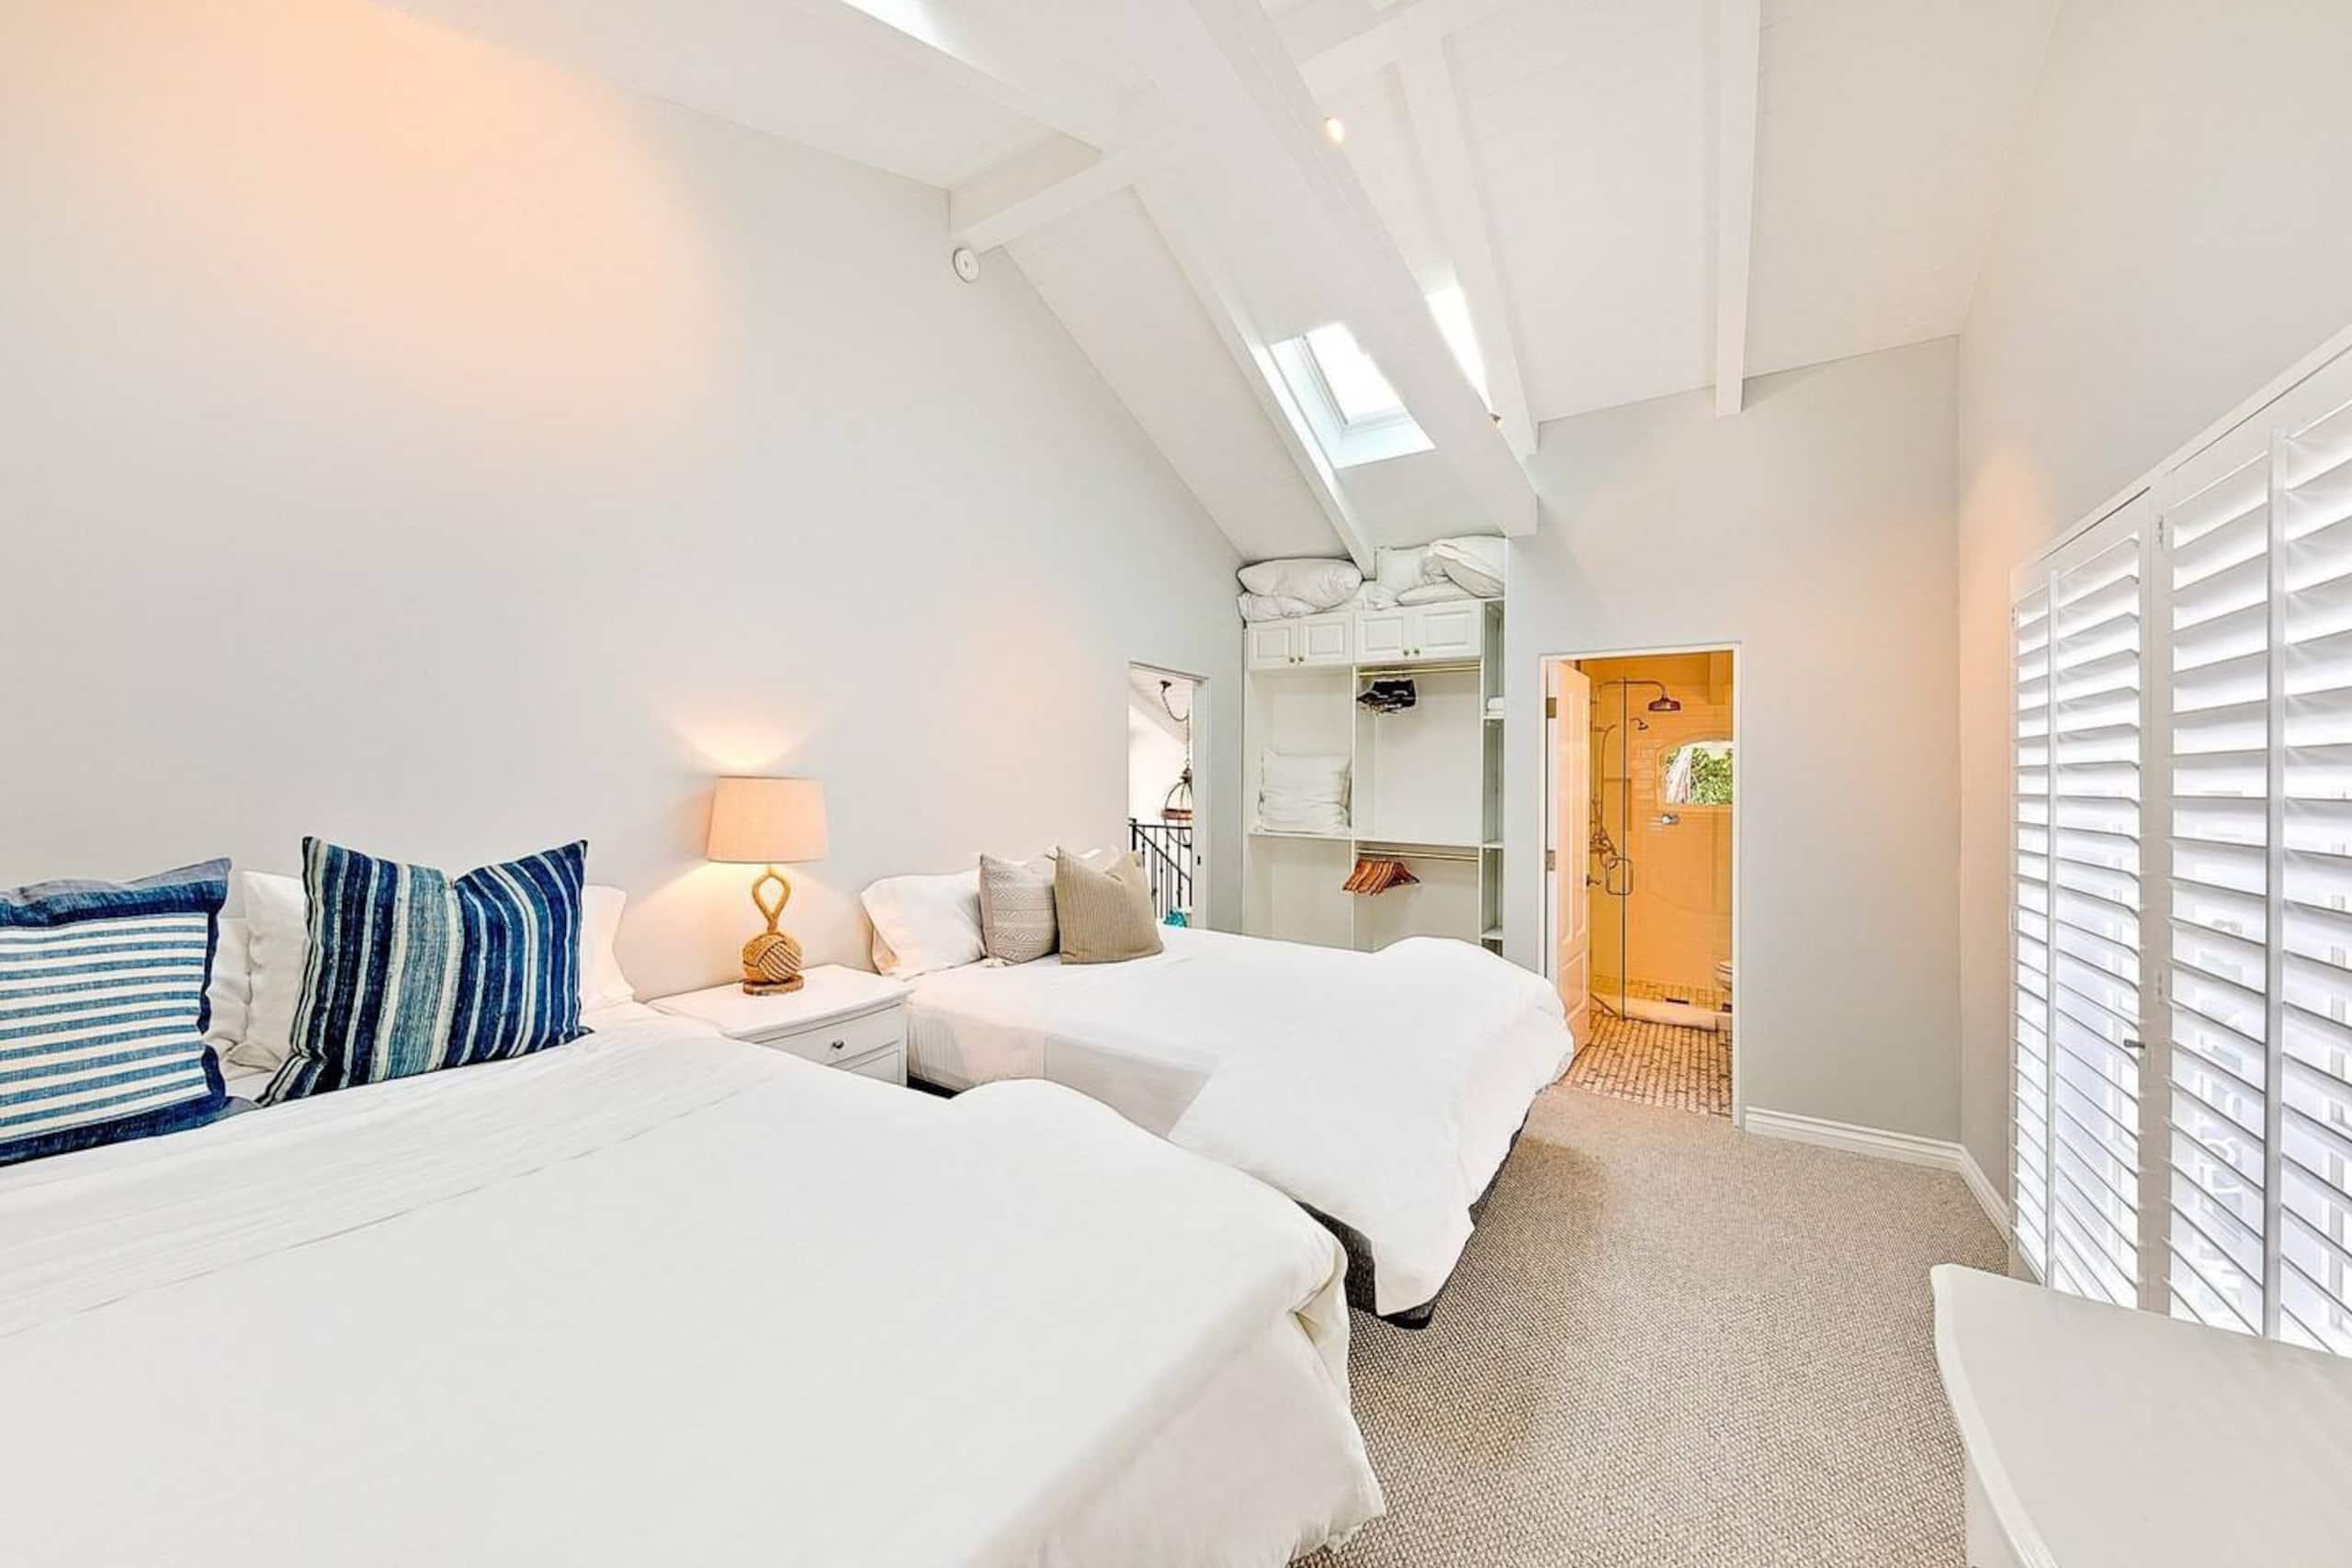 Apartment Villa Shawaiz - Beachfront Villa with 5 beds  photo 20242922